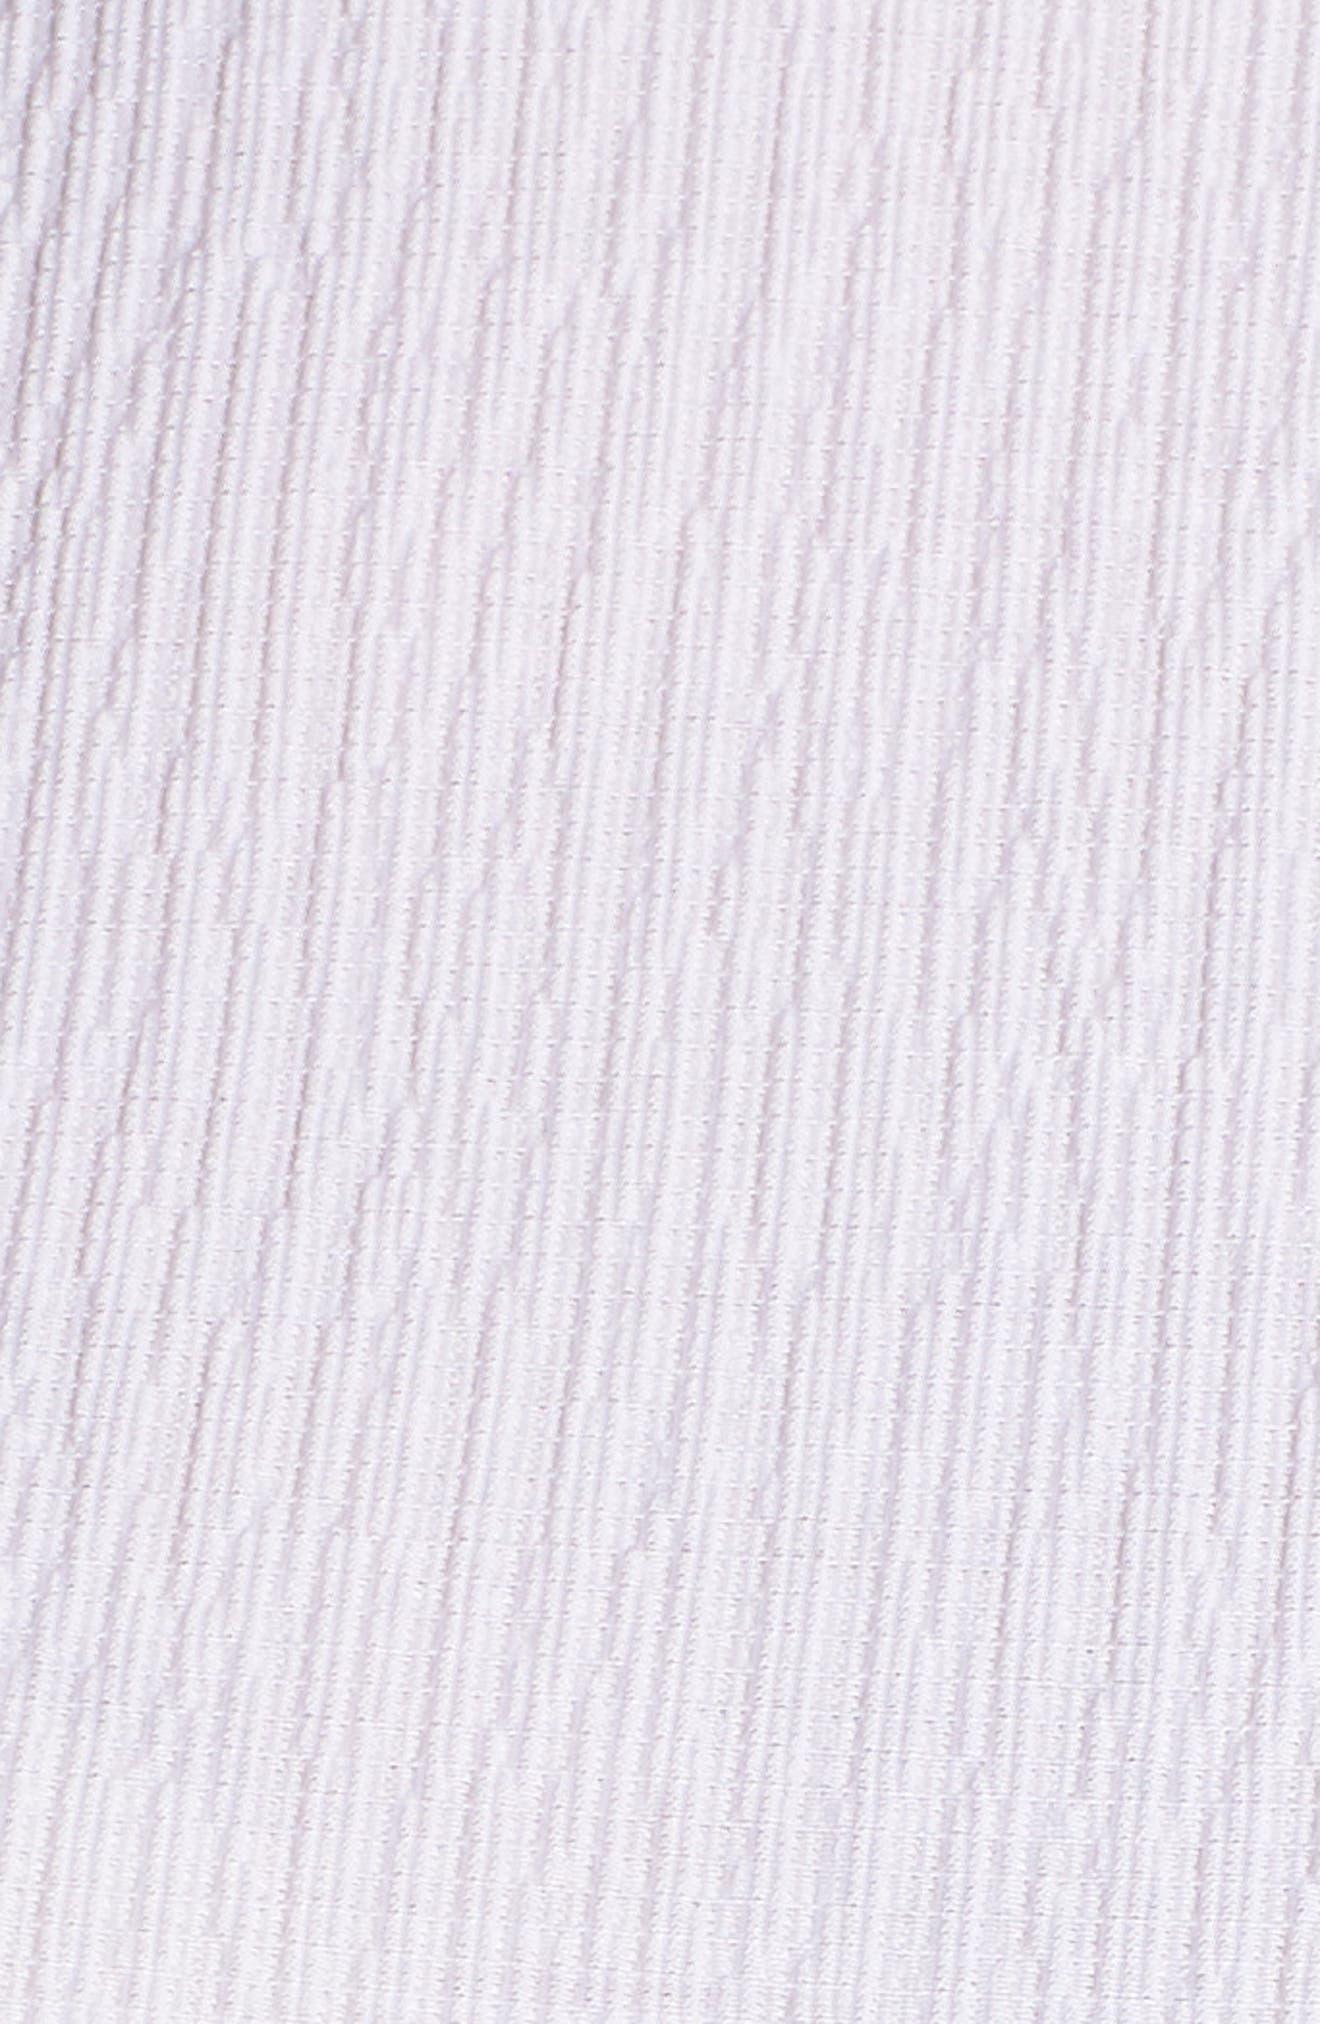 Ruffle Dress,                             Alternate thumbnail 6, color,                             White